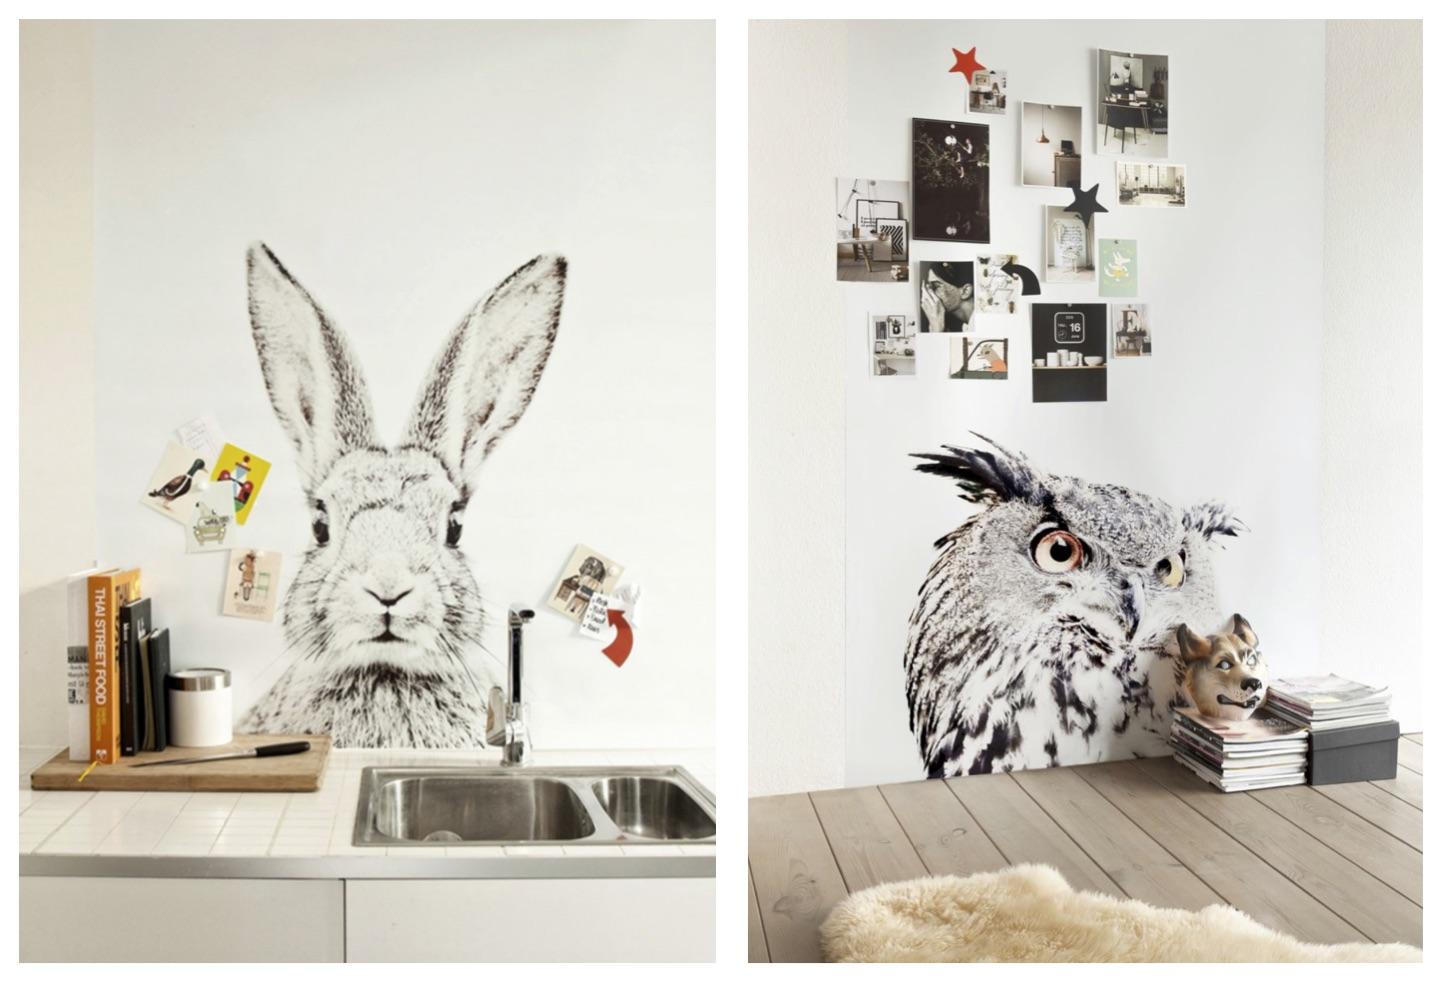 groovy magnets labelfrei me. Black Bedroom Furniture Sets. Home Design Ideas